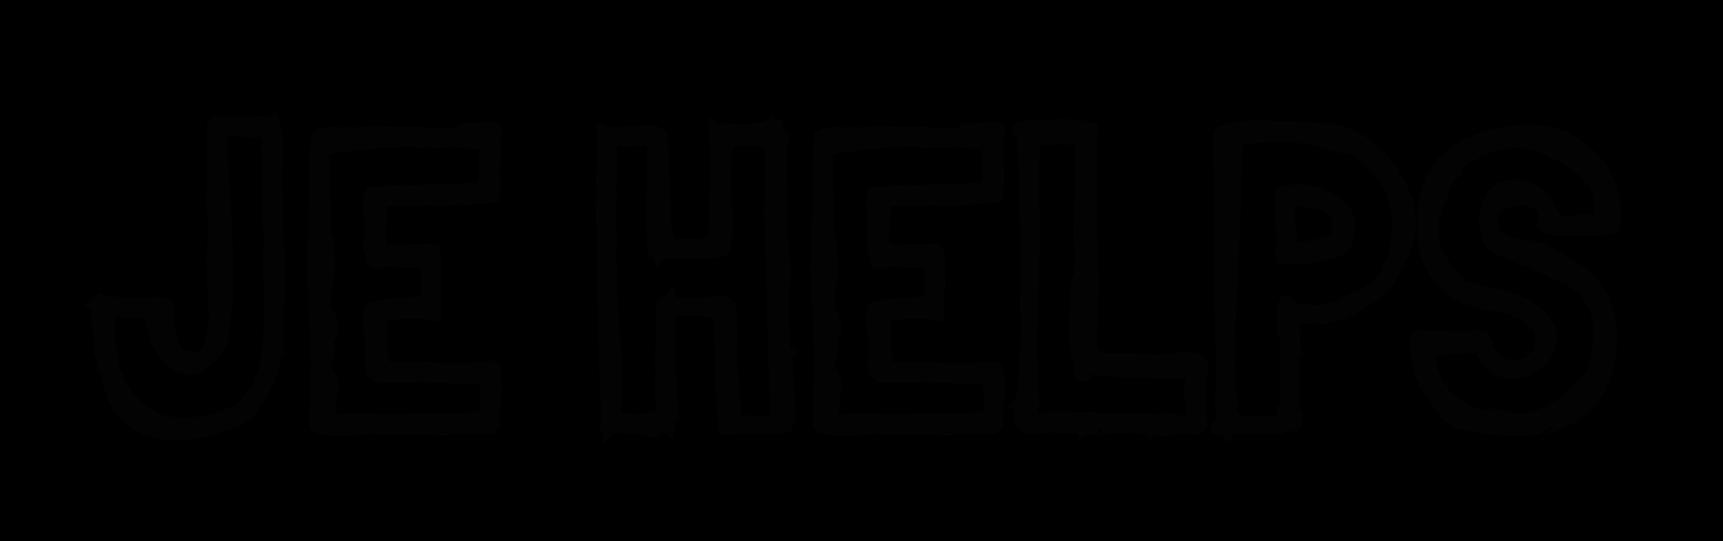 JE HELPS-logo-black crop.png